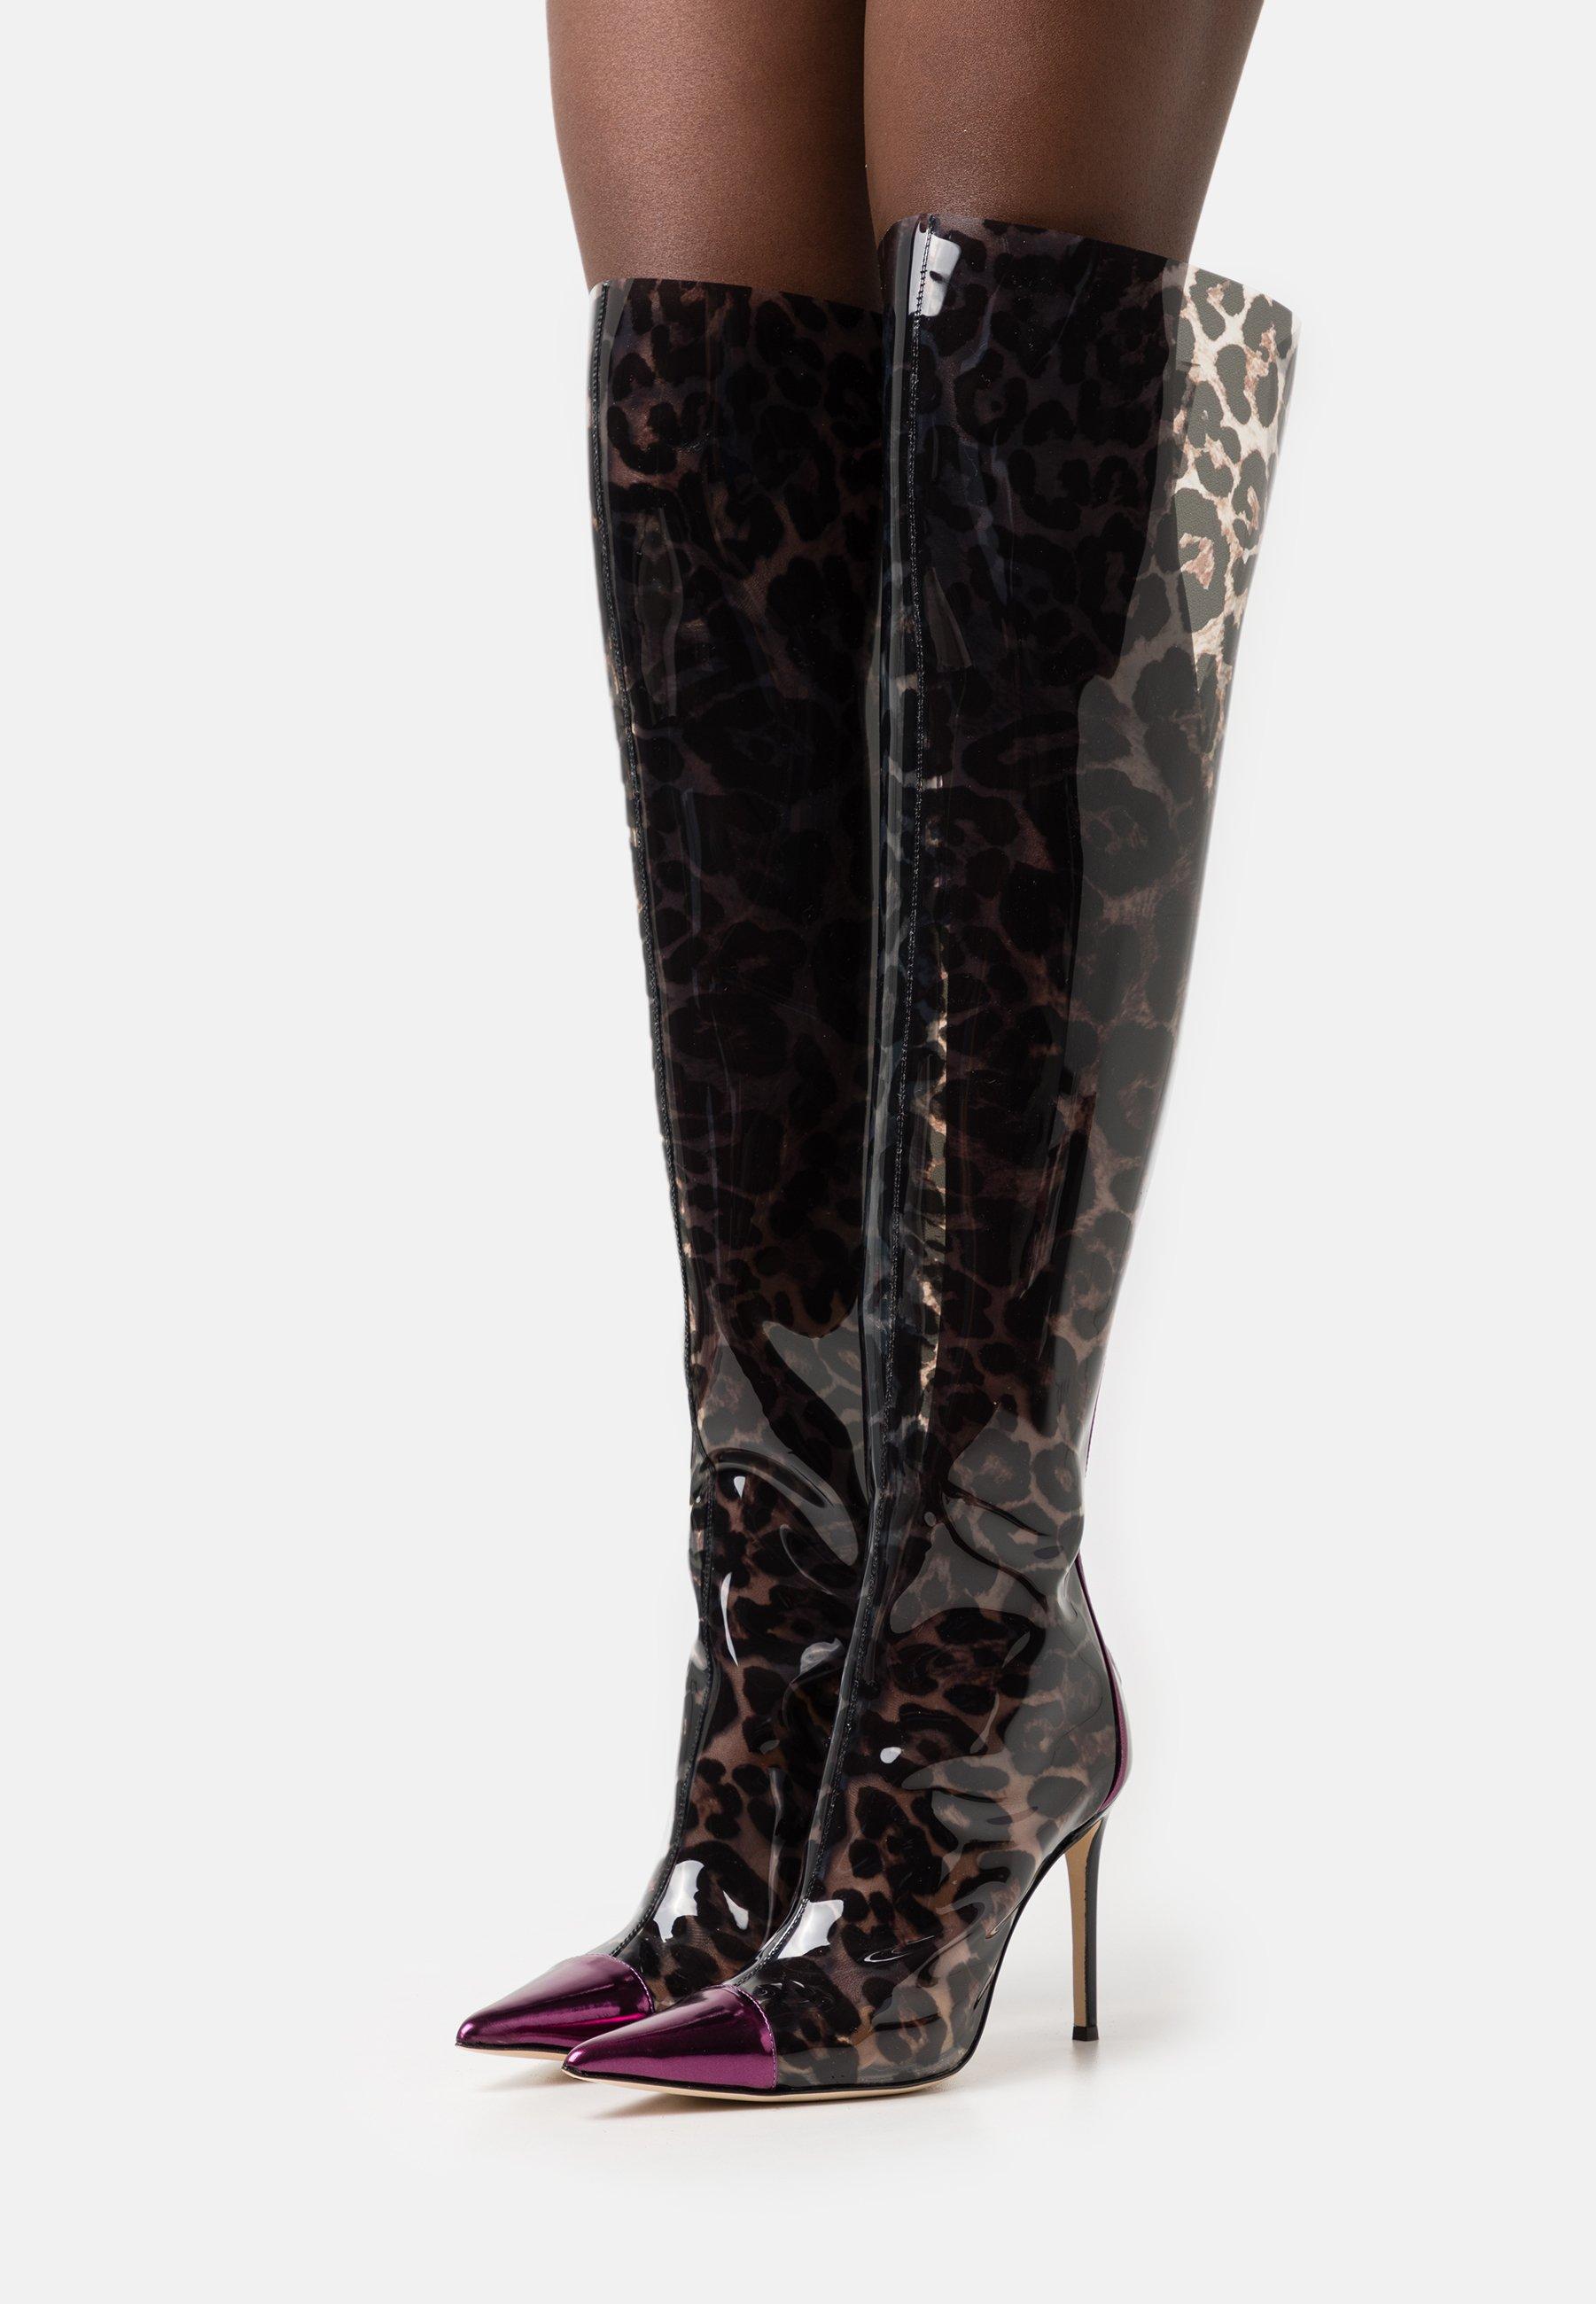 Damen BOOT - High Heel Stiefel - istinto vinile